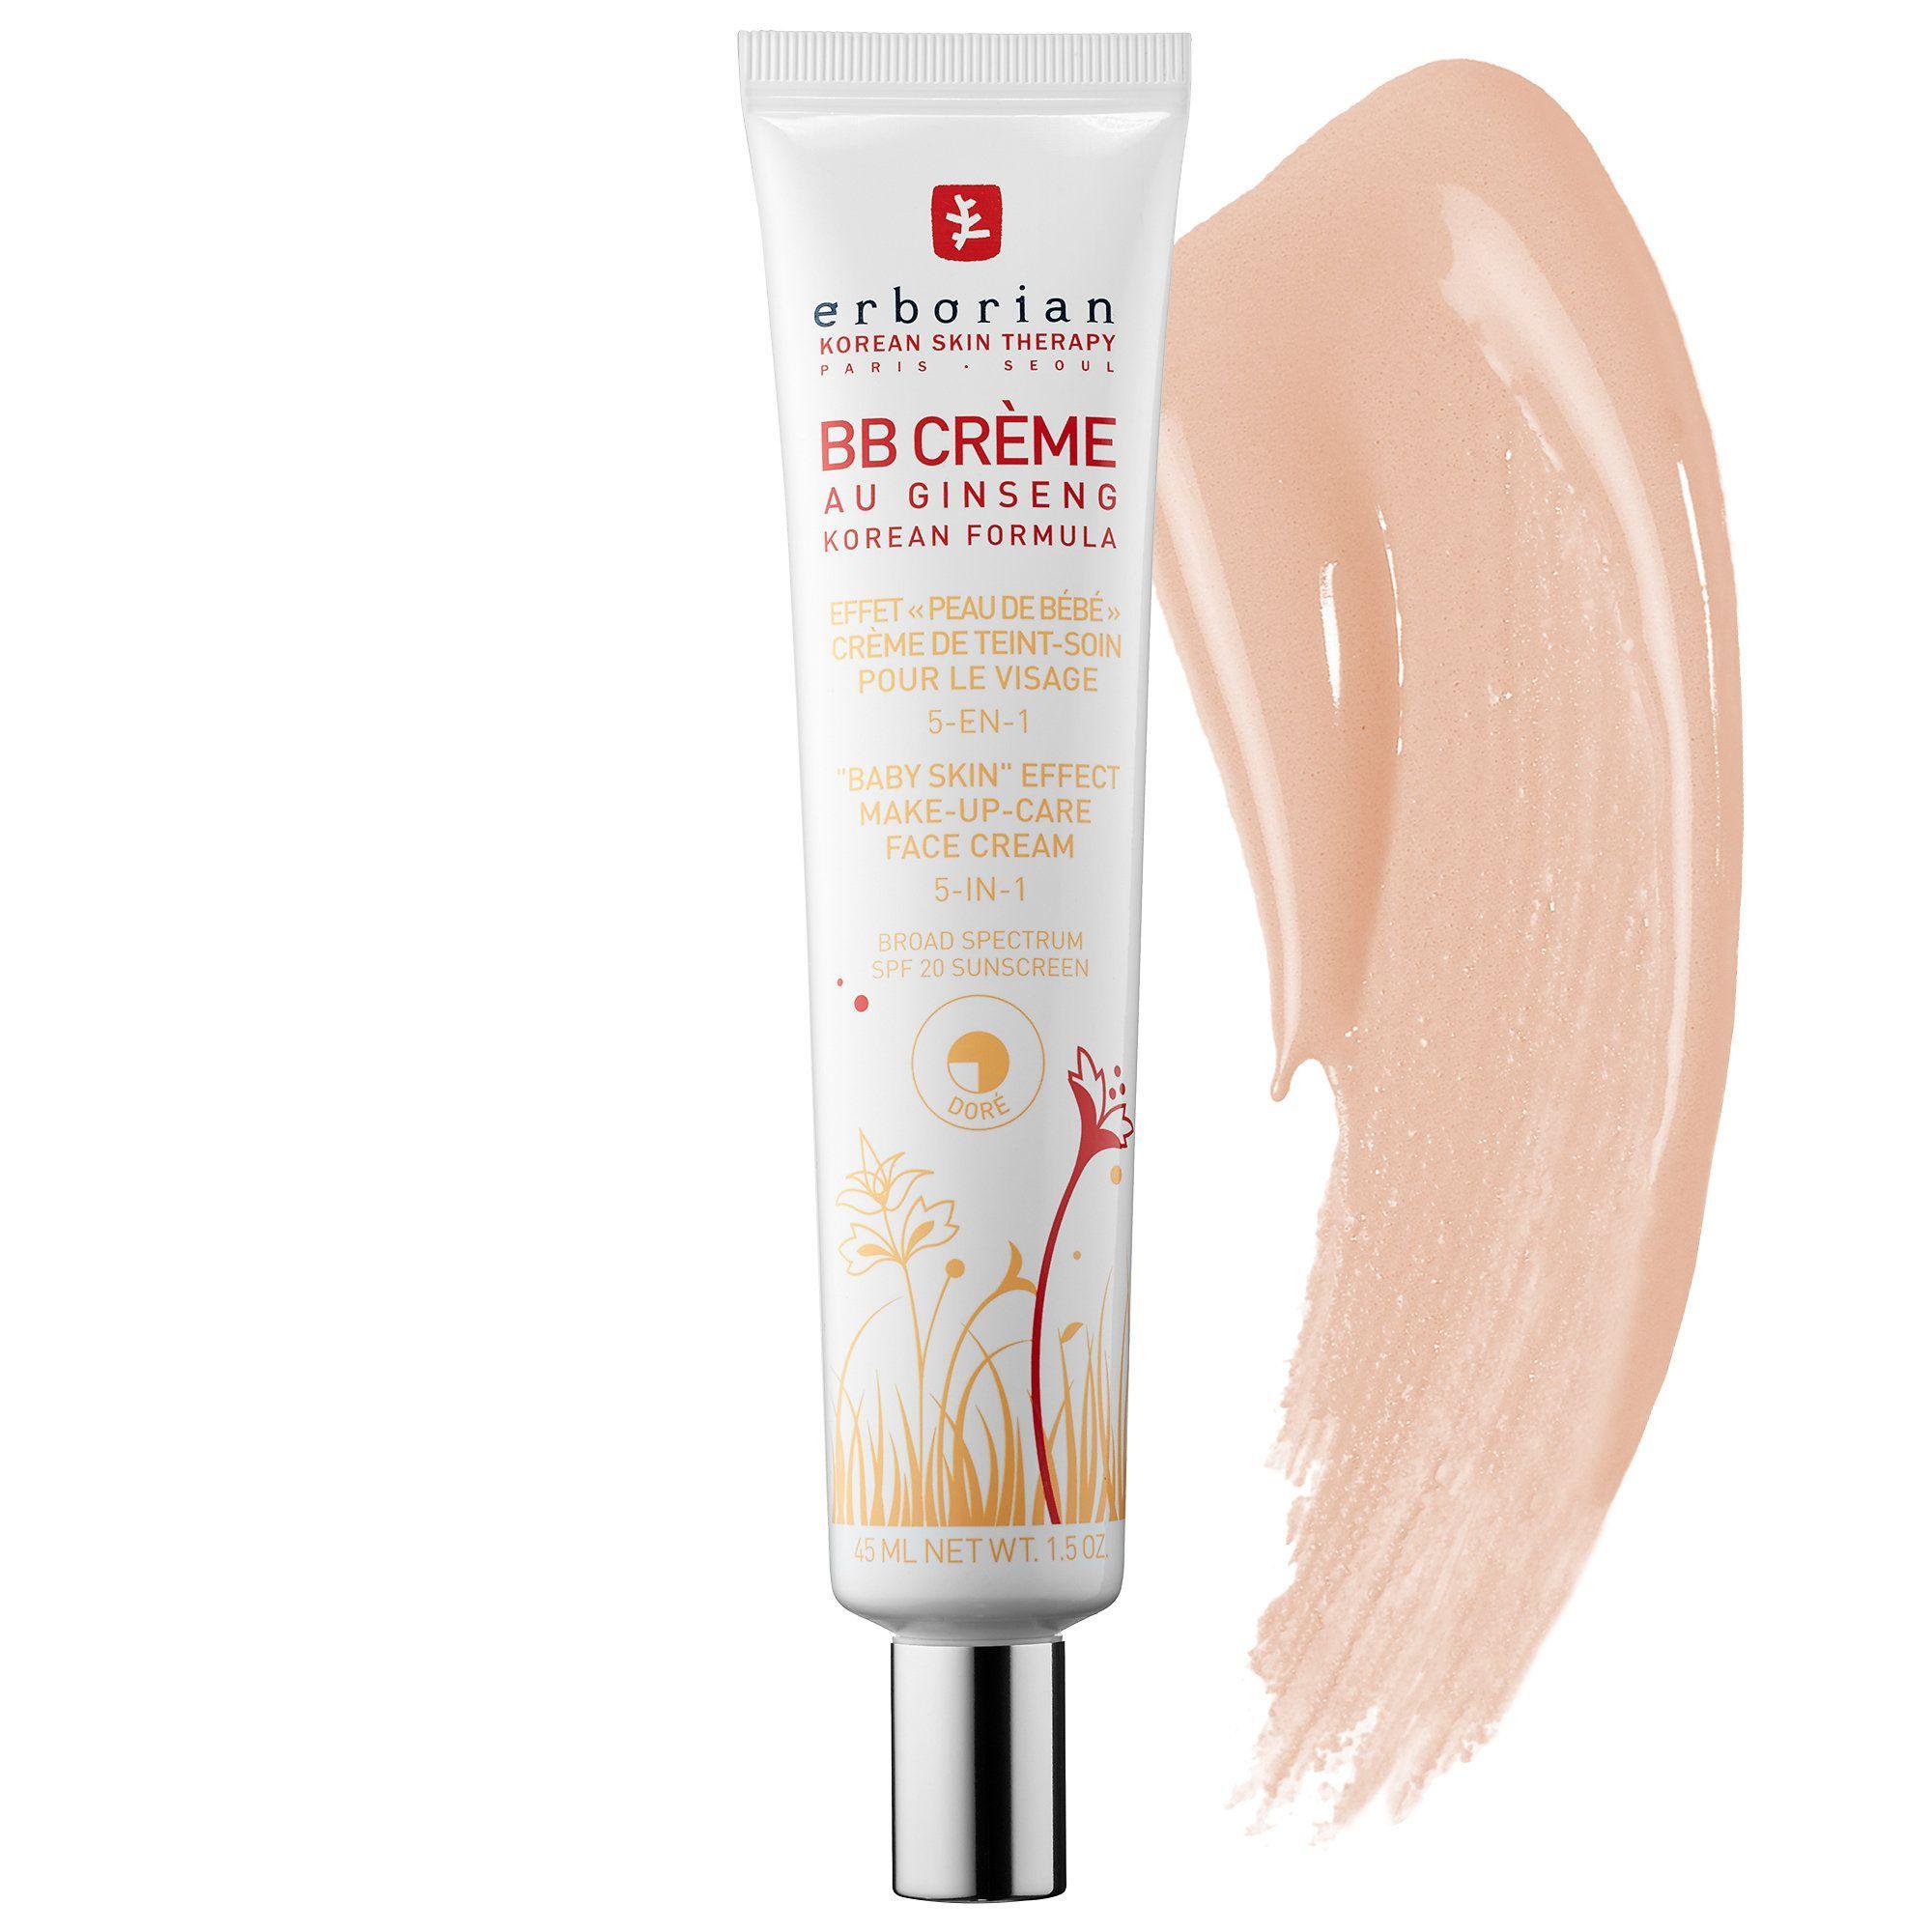 Beauty Brands That Combine Makeup & Skin Care Sephora